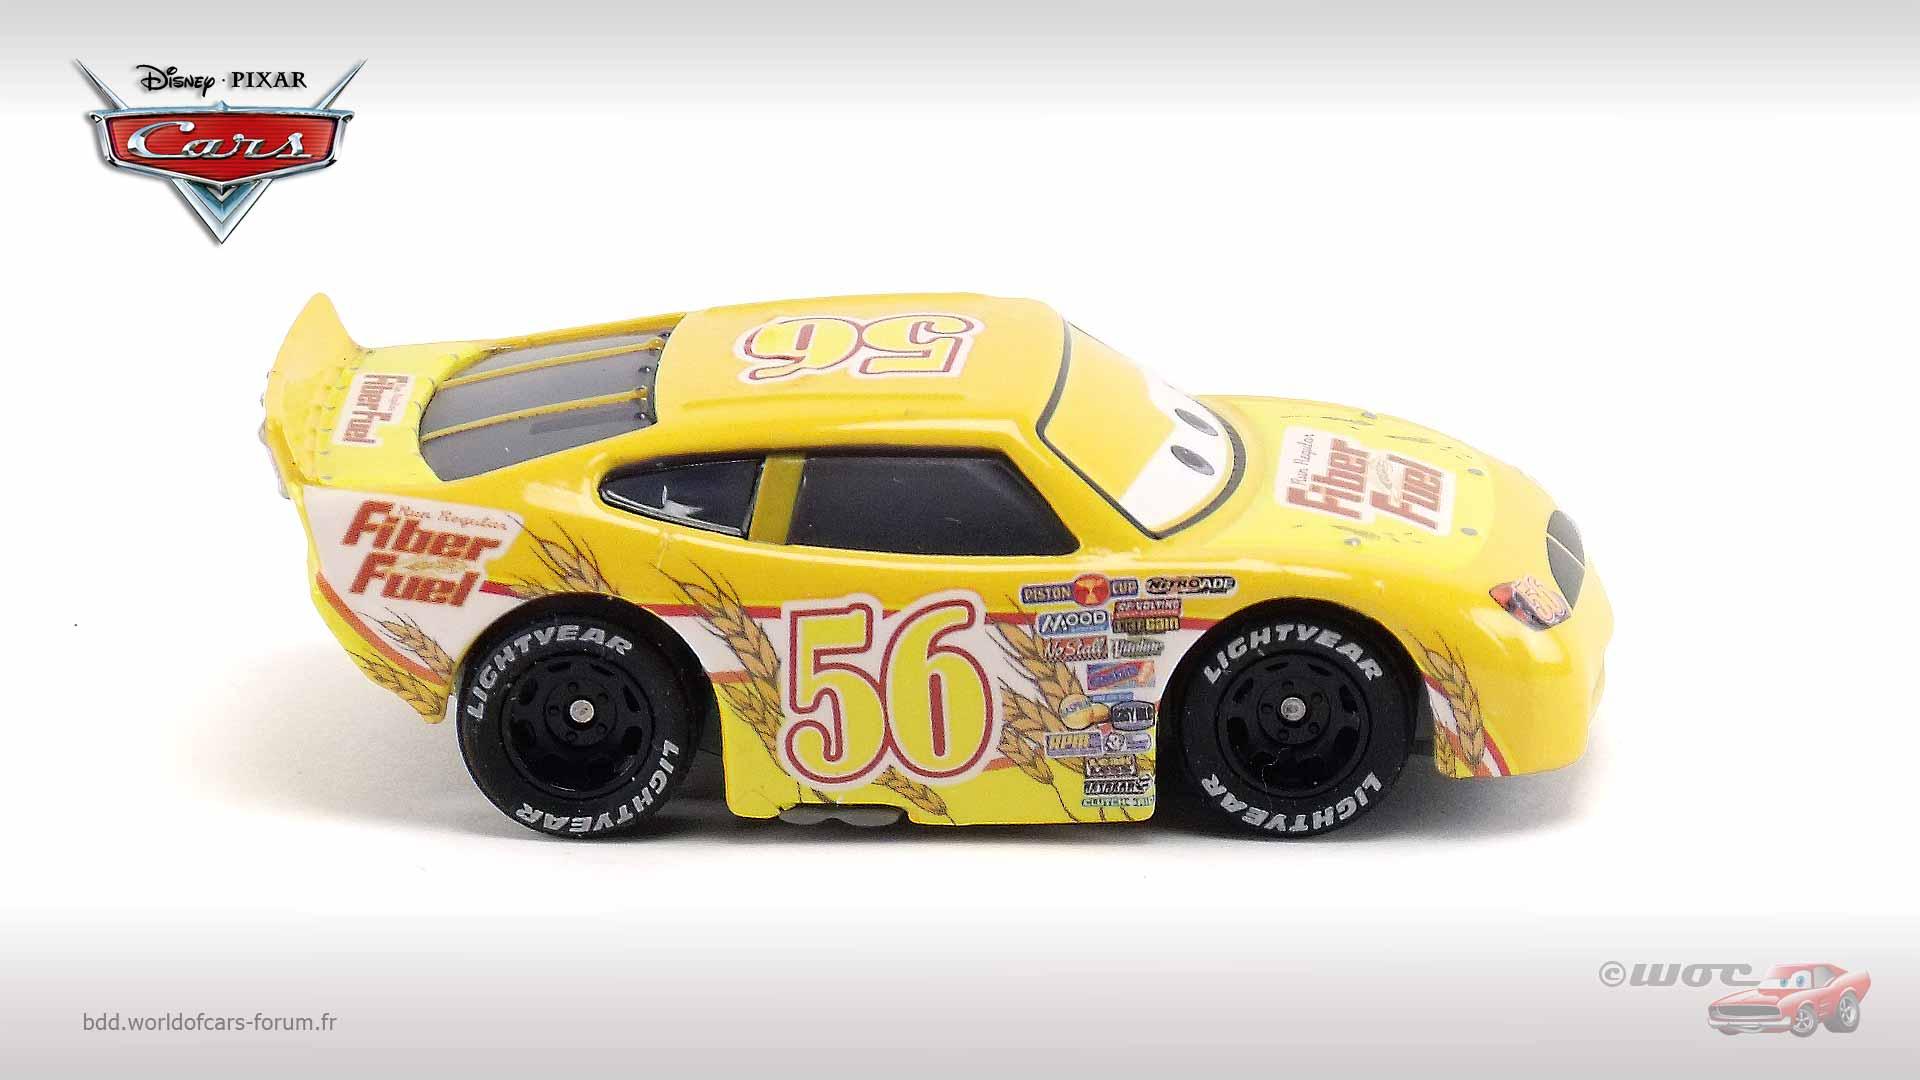 7 11 Gas Card >> World of Cars : présentation du personnage Fiber Fuel (#56) - Brush Curber